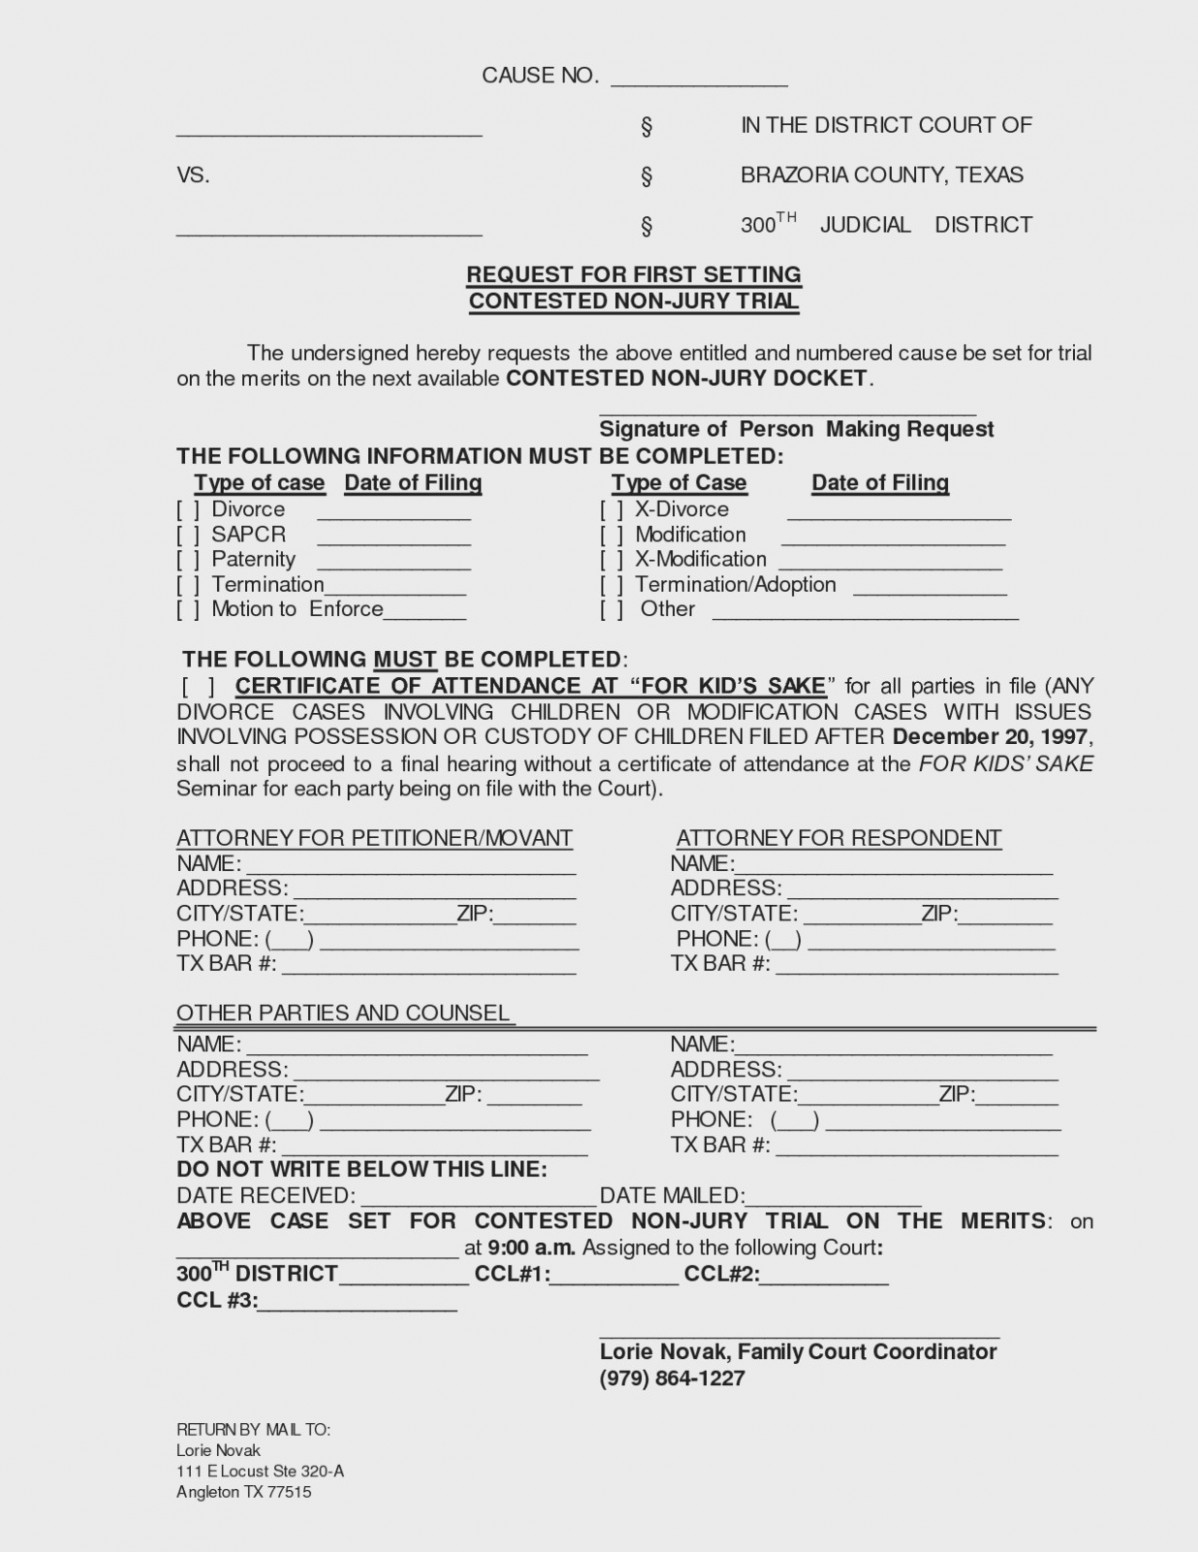 Texas Divorce Decree Template Best Of Free Printable Divorce Papers - Free Printable Nj Divorce Forms